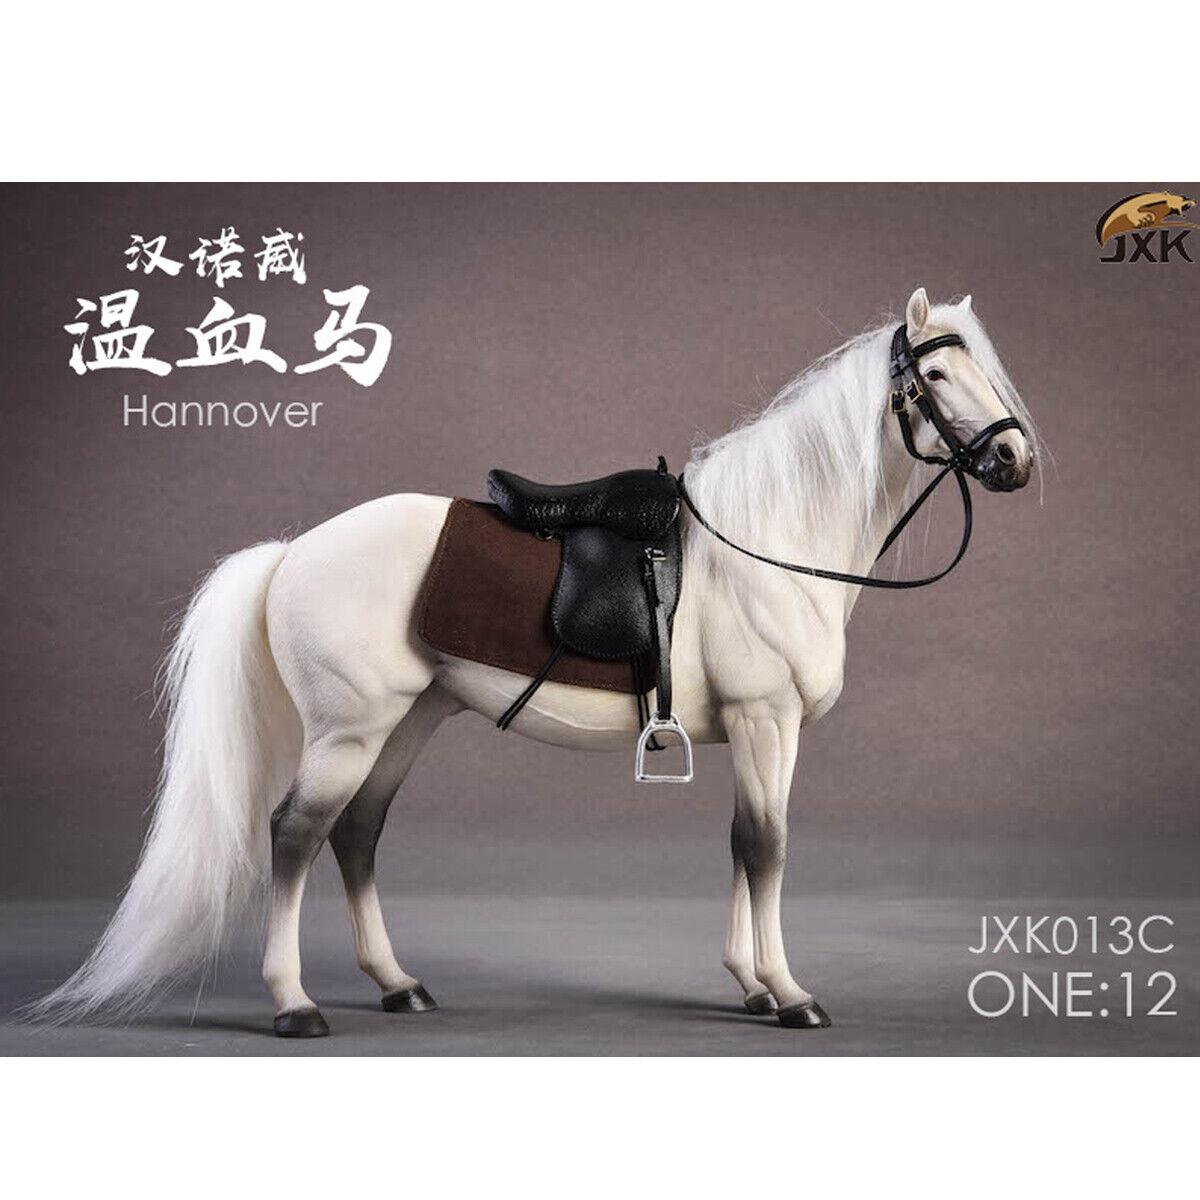 JXK Studio JXK013C 1 12 Scale Germany Hannover Animal Hanoverian Horse Model